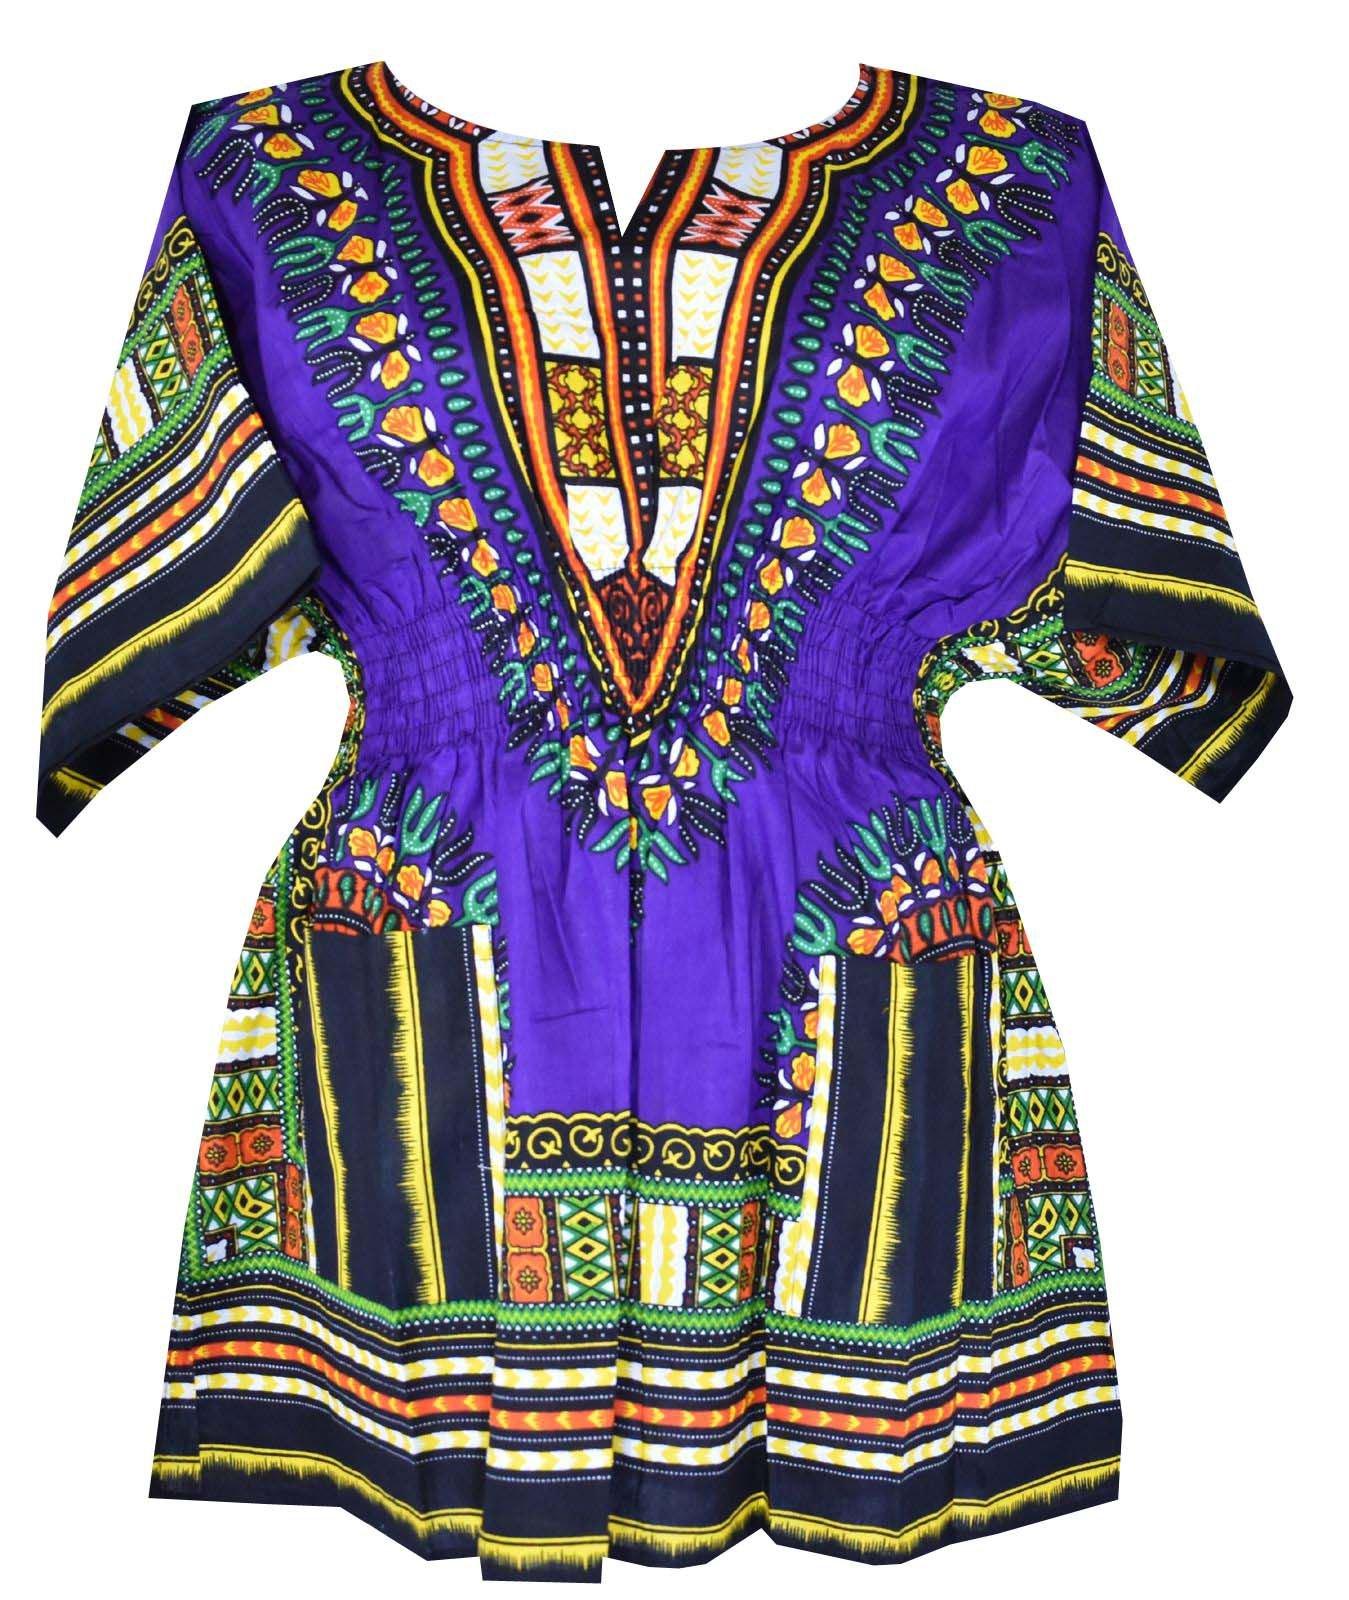 Decoraapparel Womens Dashiki Dress Cotton Shirt Elastic Waist Traditional wear Bright Colors